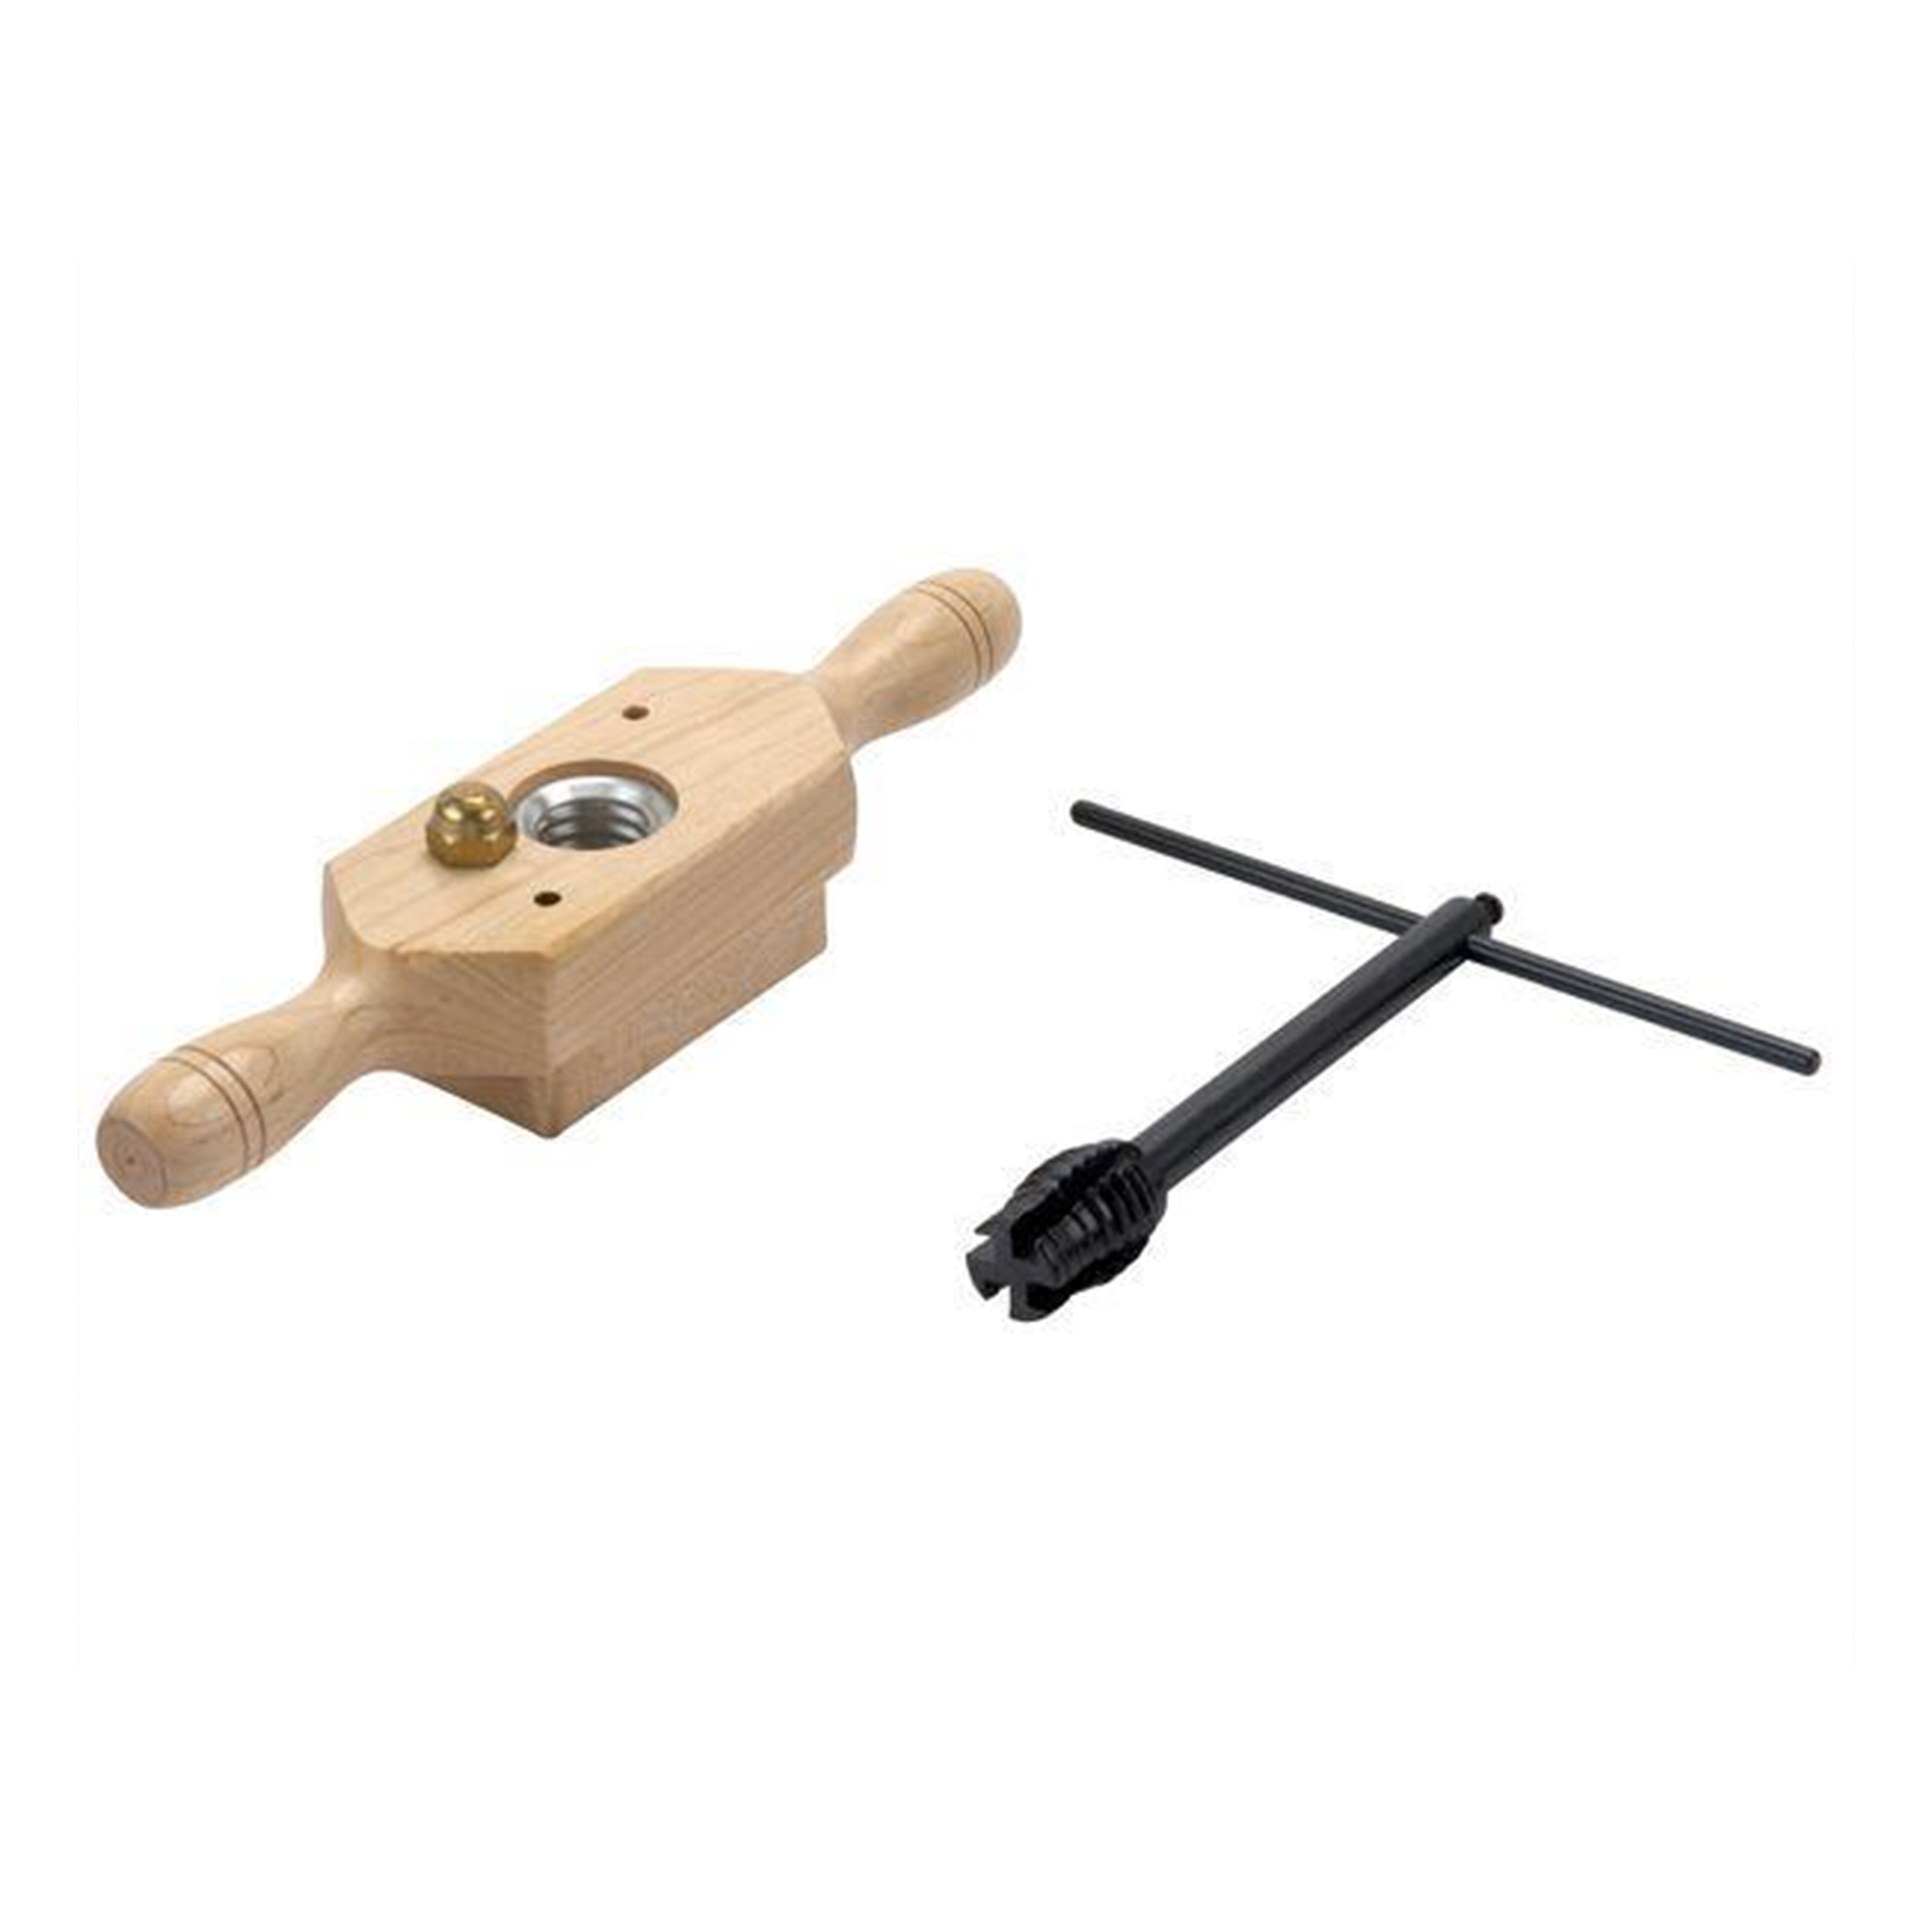 Woodthreading Kit, 1-1/4 x 6TPI